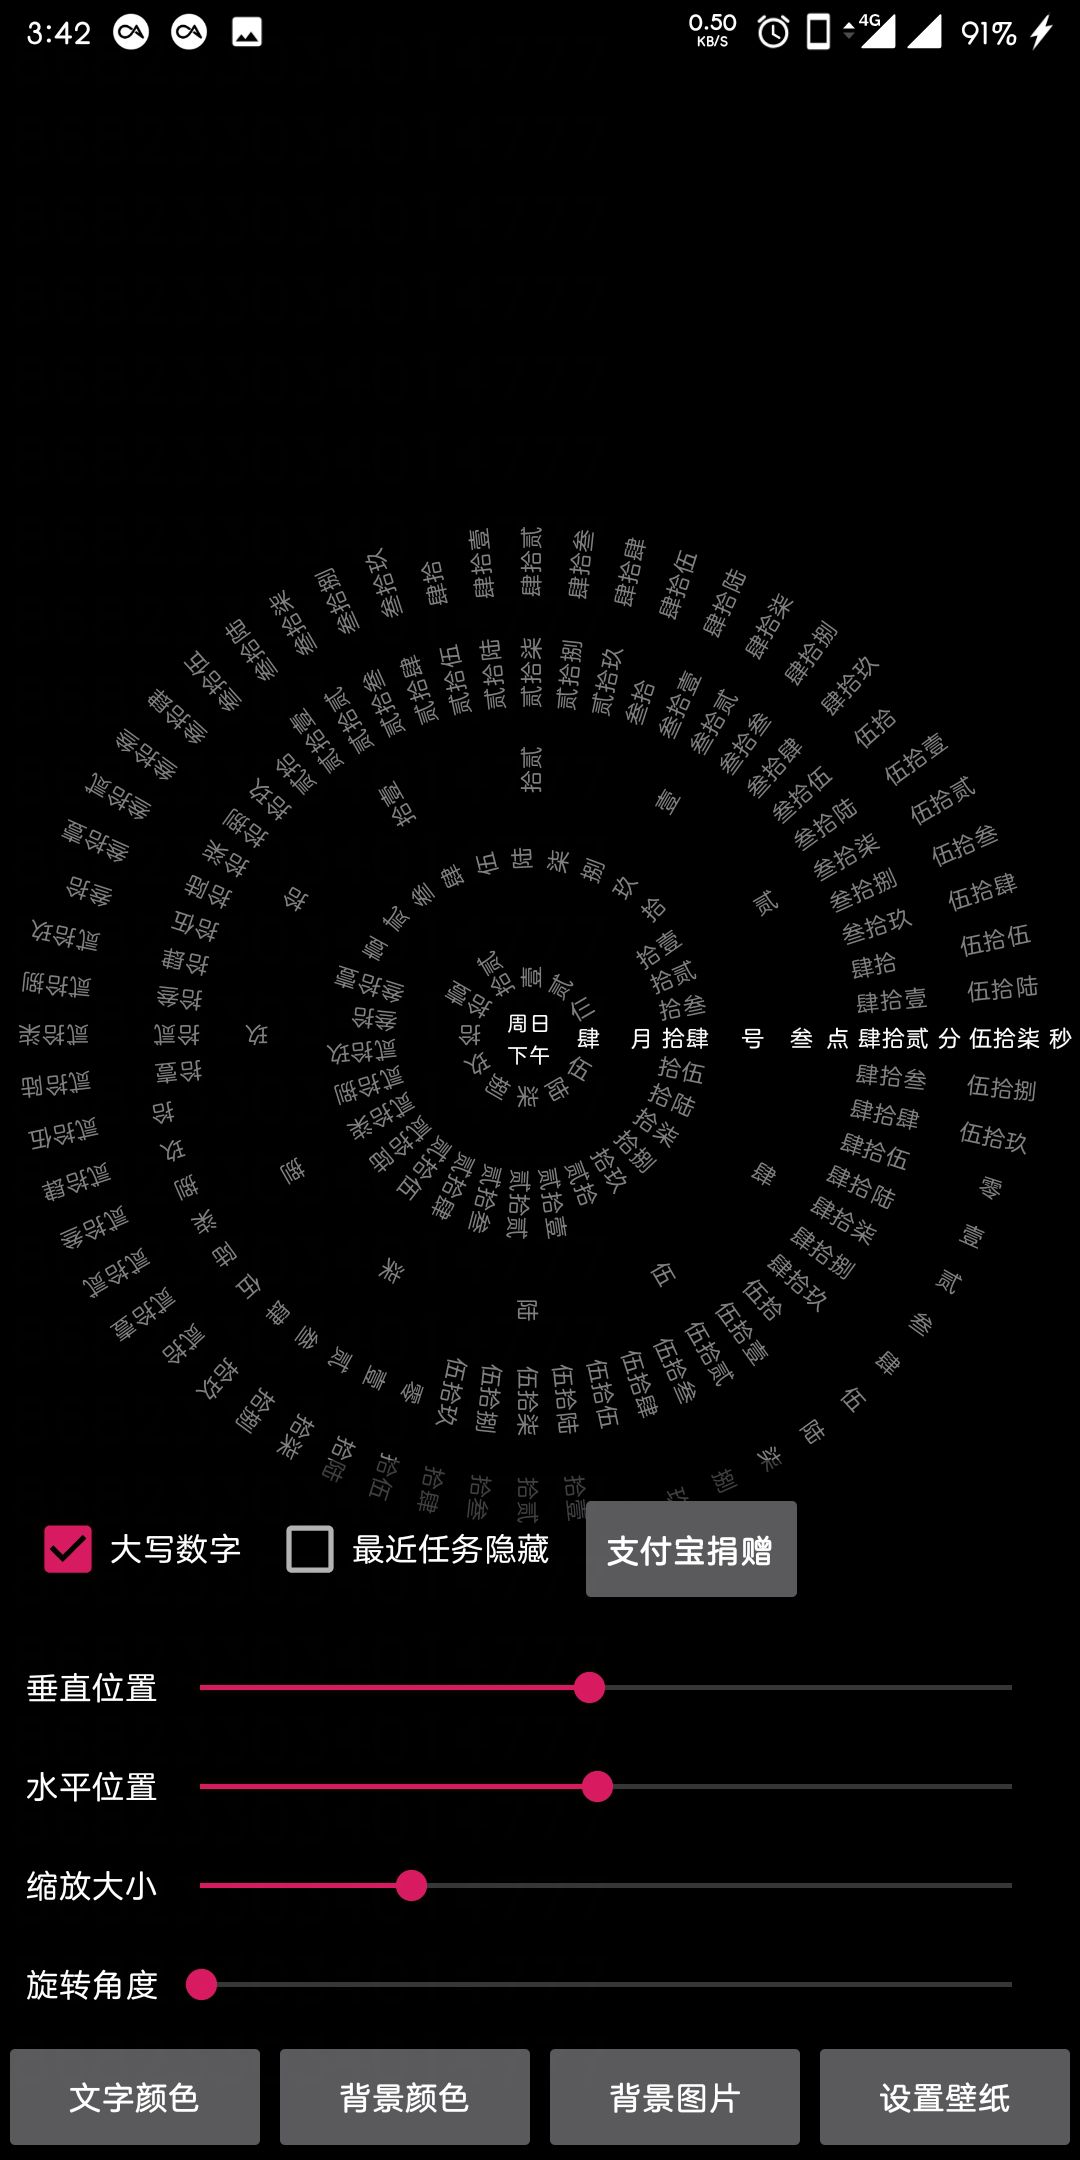 Screenshot_20190414-154258.png